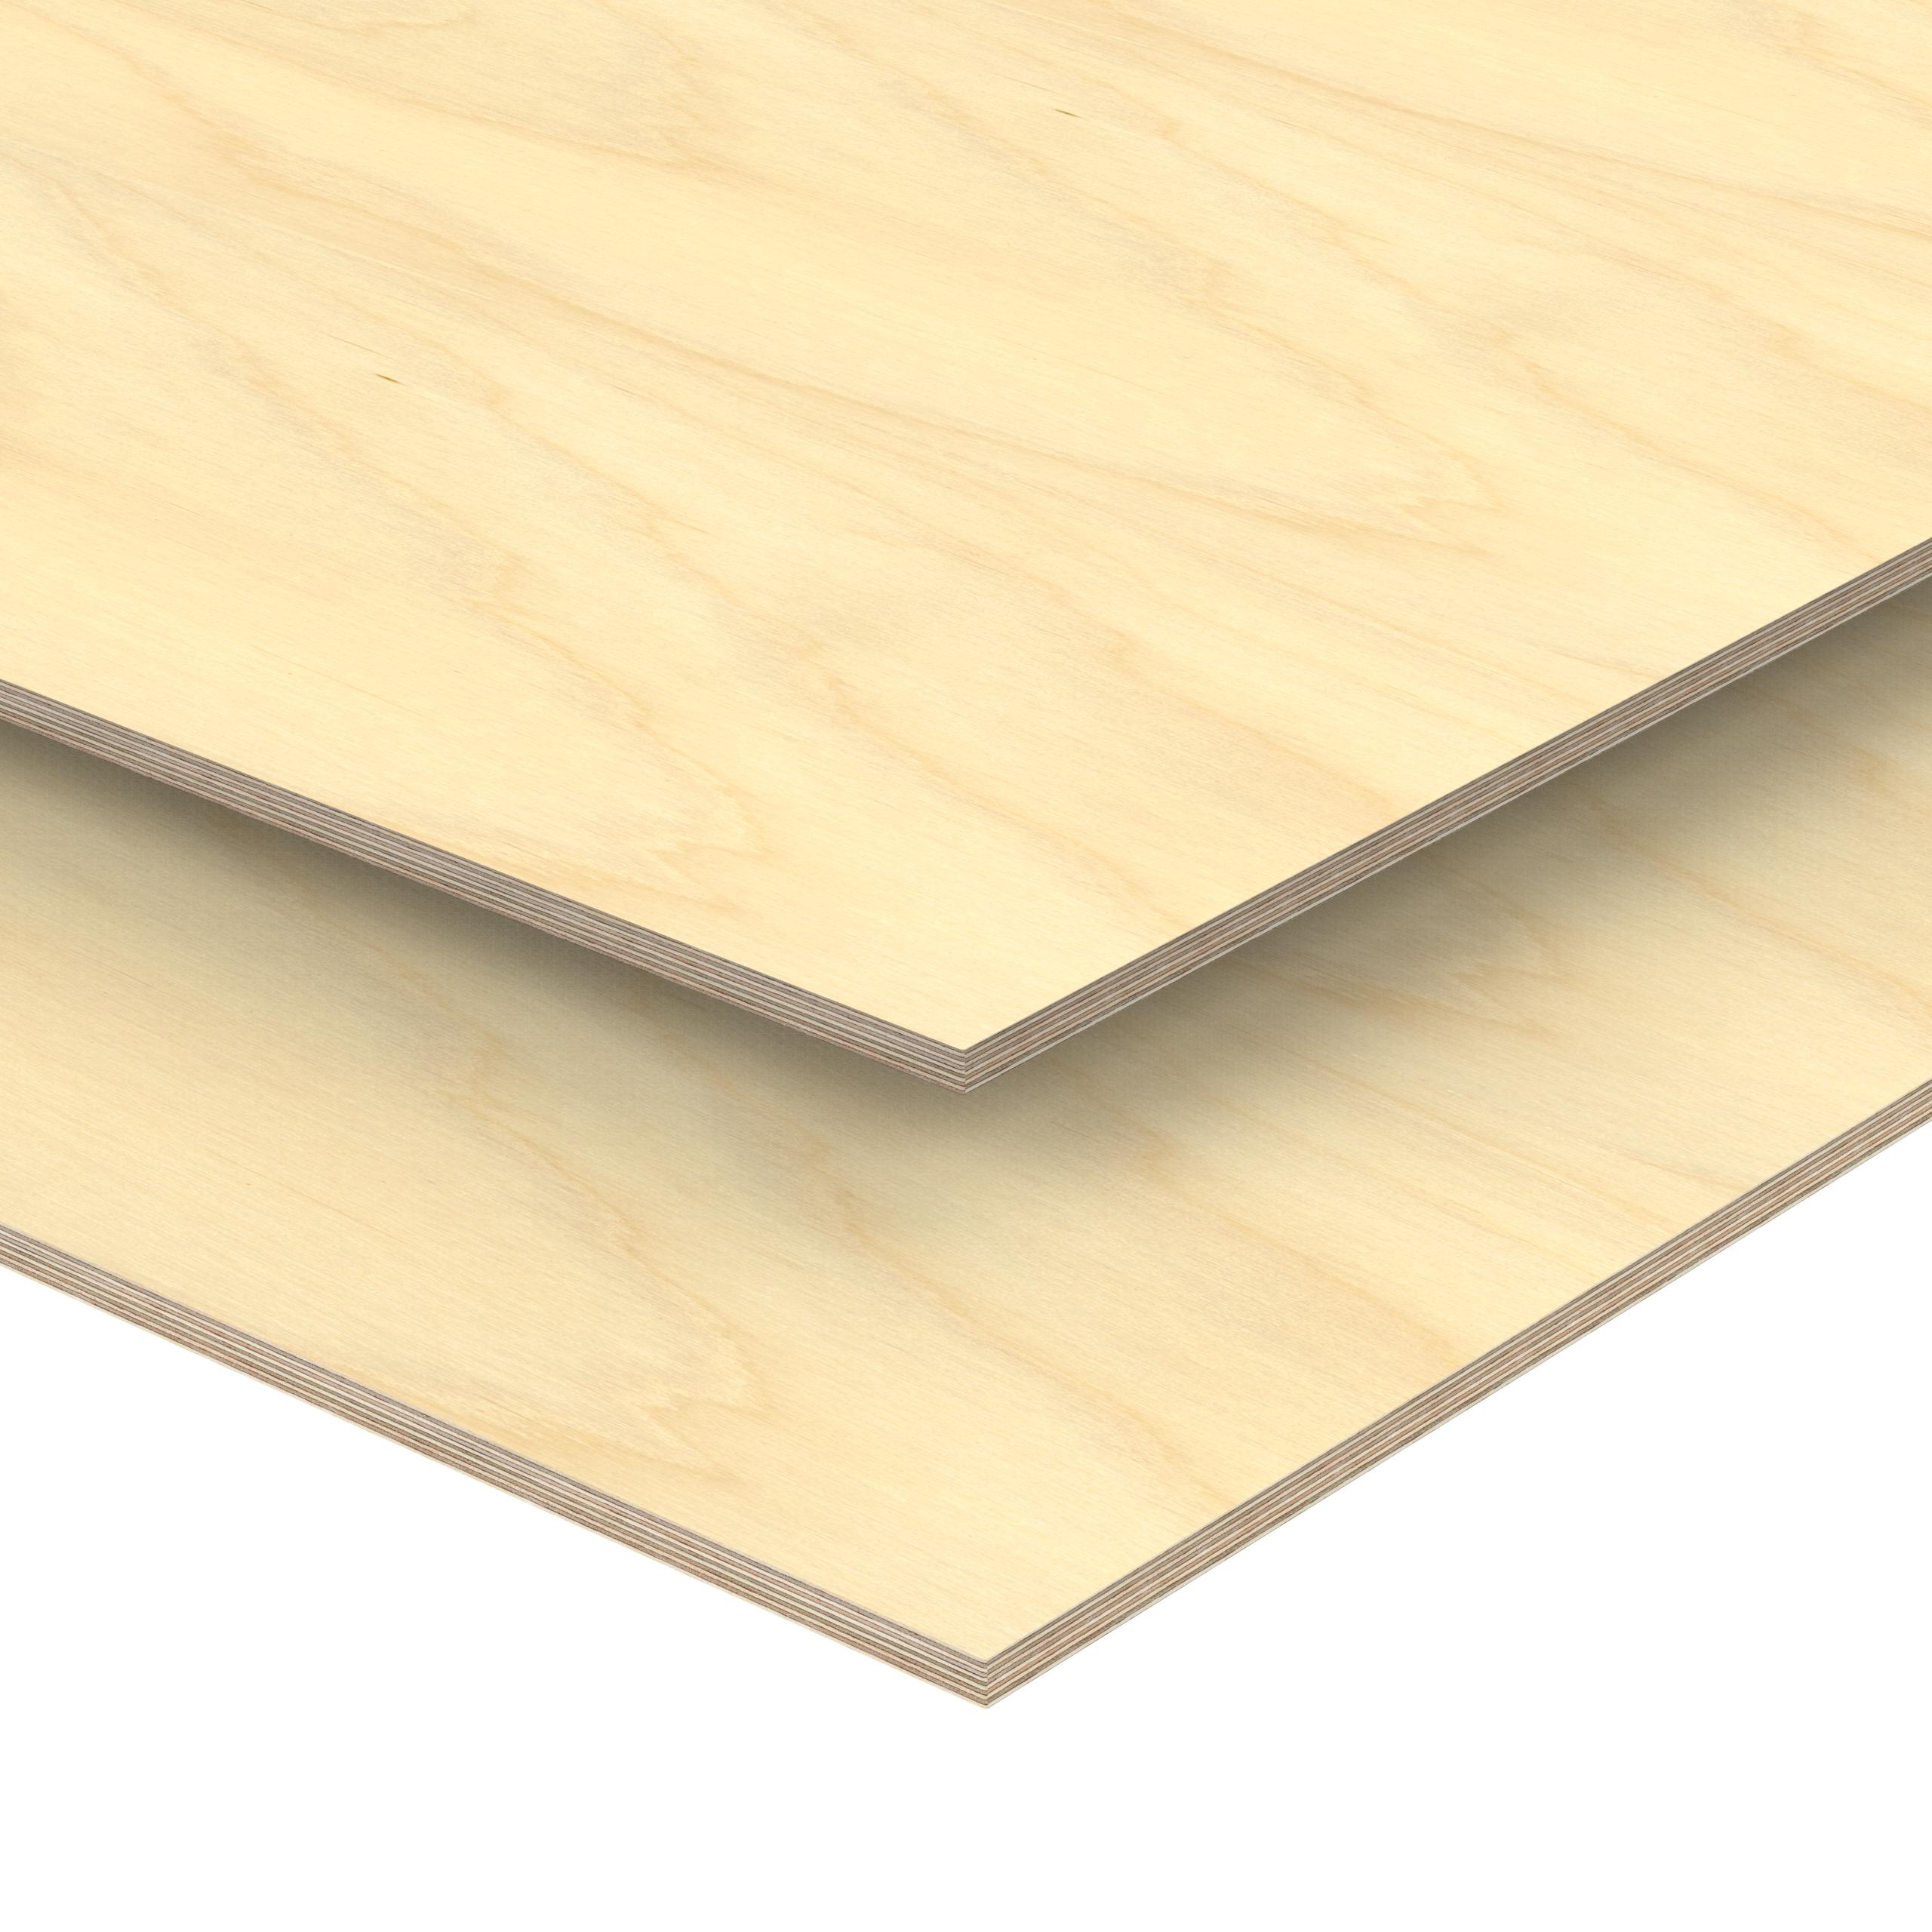 15mm Multiplex Zuschnitt L/änge bis 200cm Multiplexplatten Zuschnitte Auswahl 30x10 cm